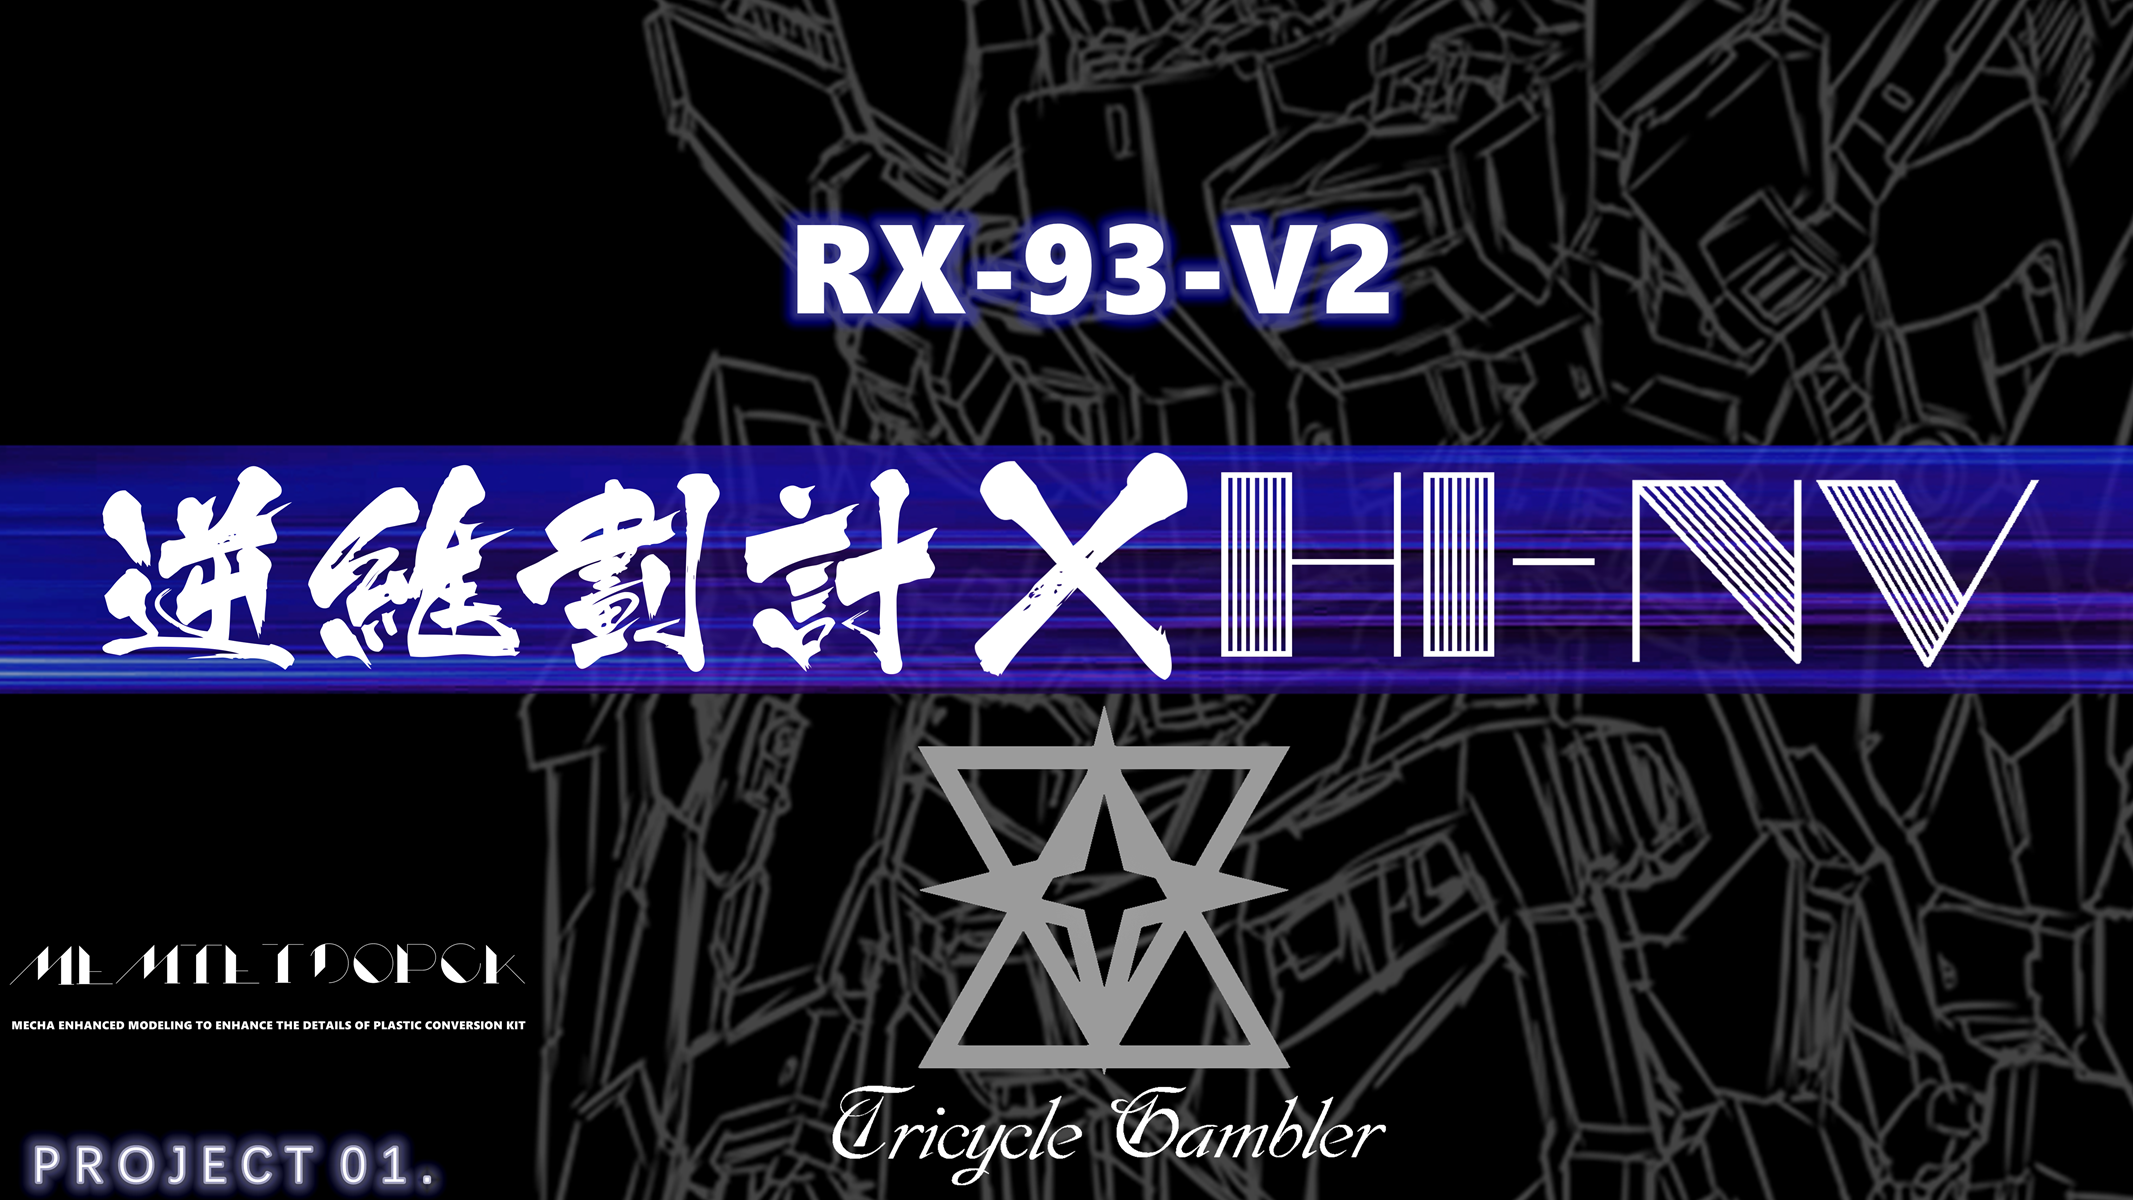 S617_TRICYCLE_GAMBLER_S617_hi_nu_yujiaoland_018.png